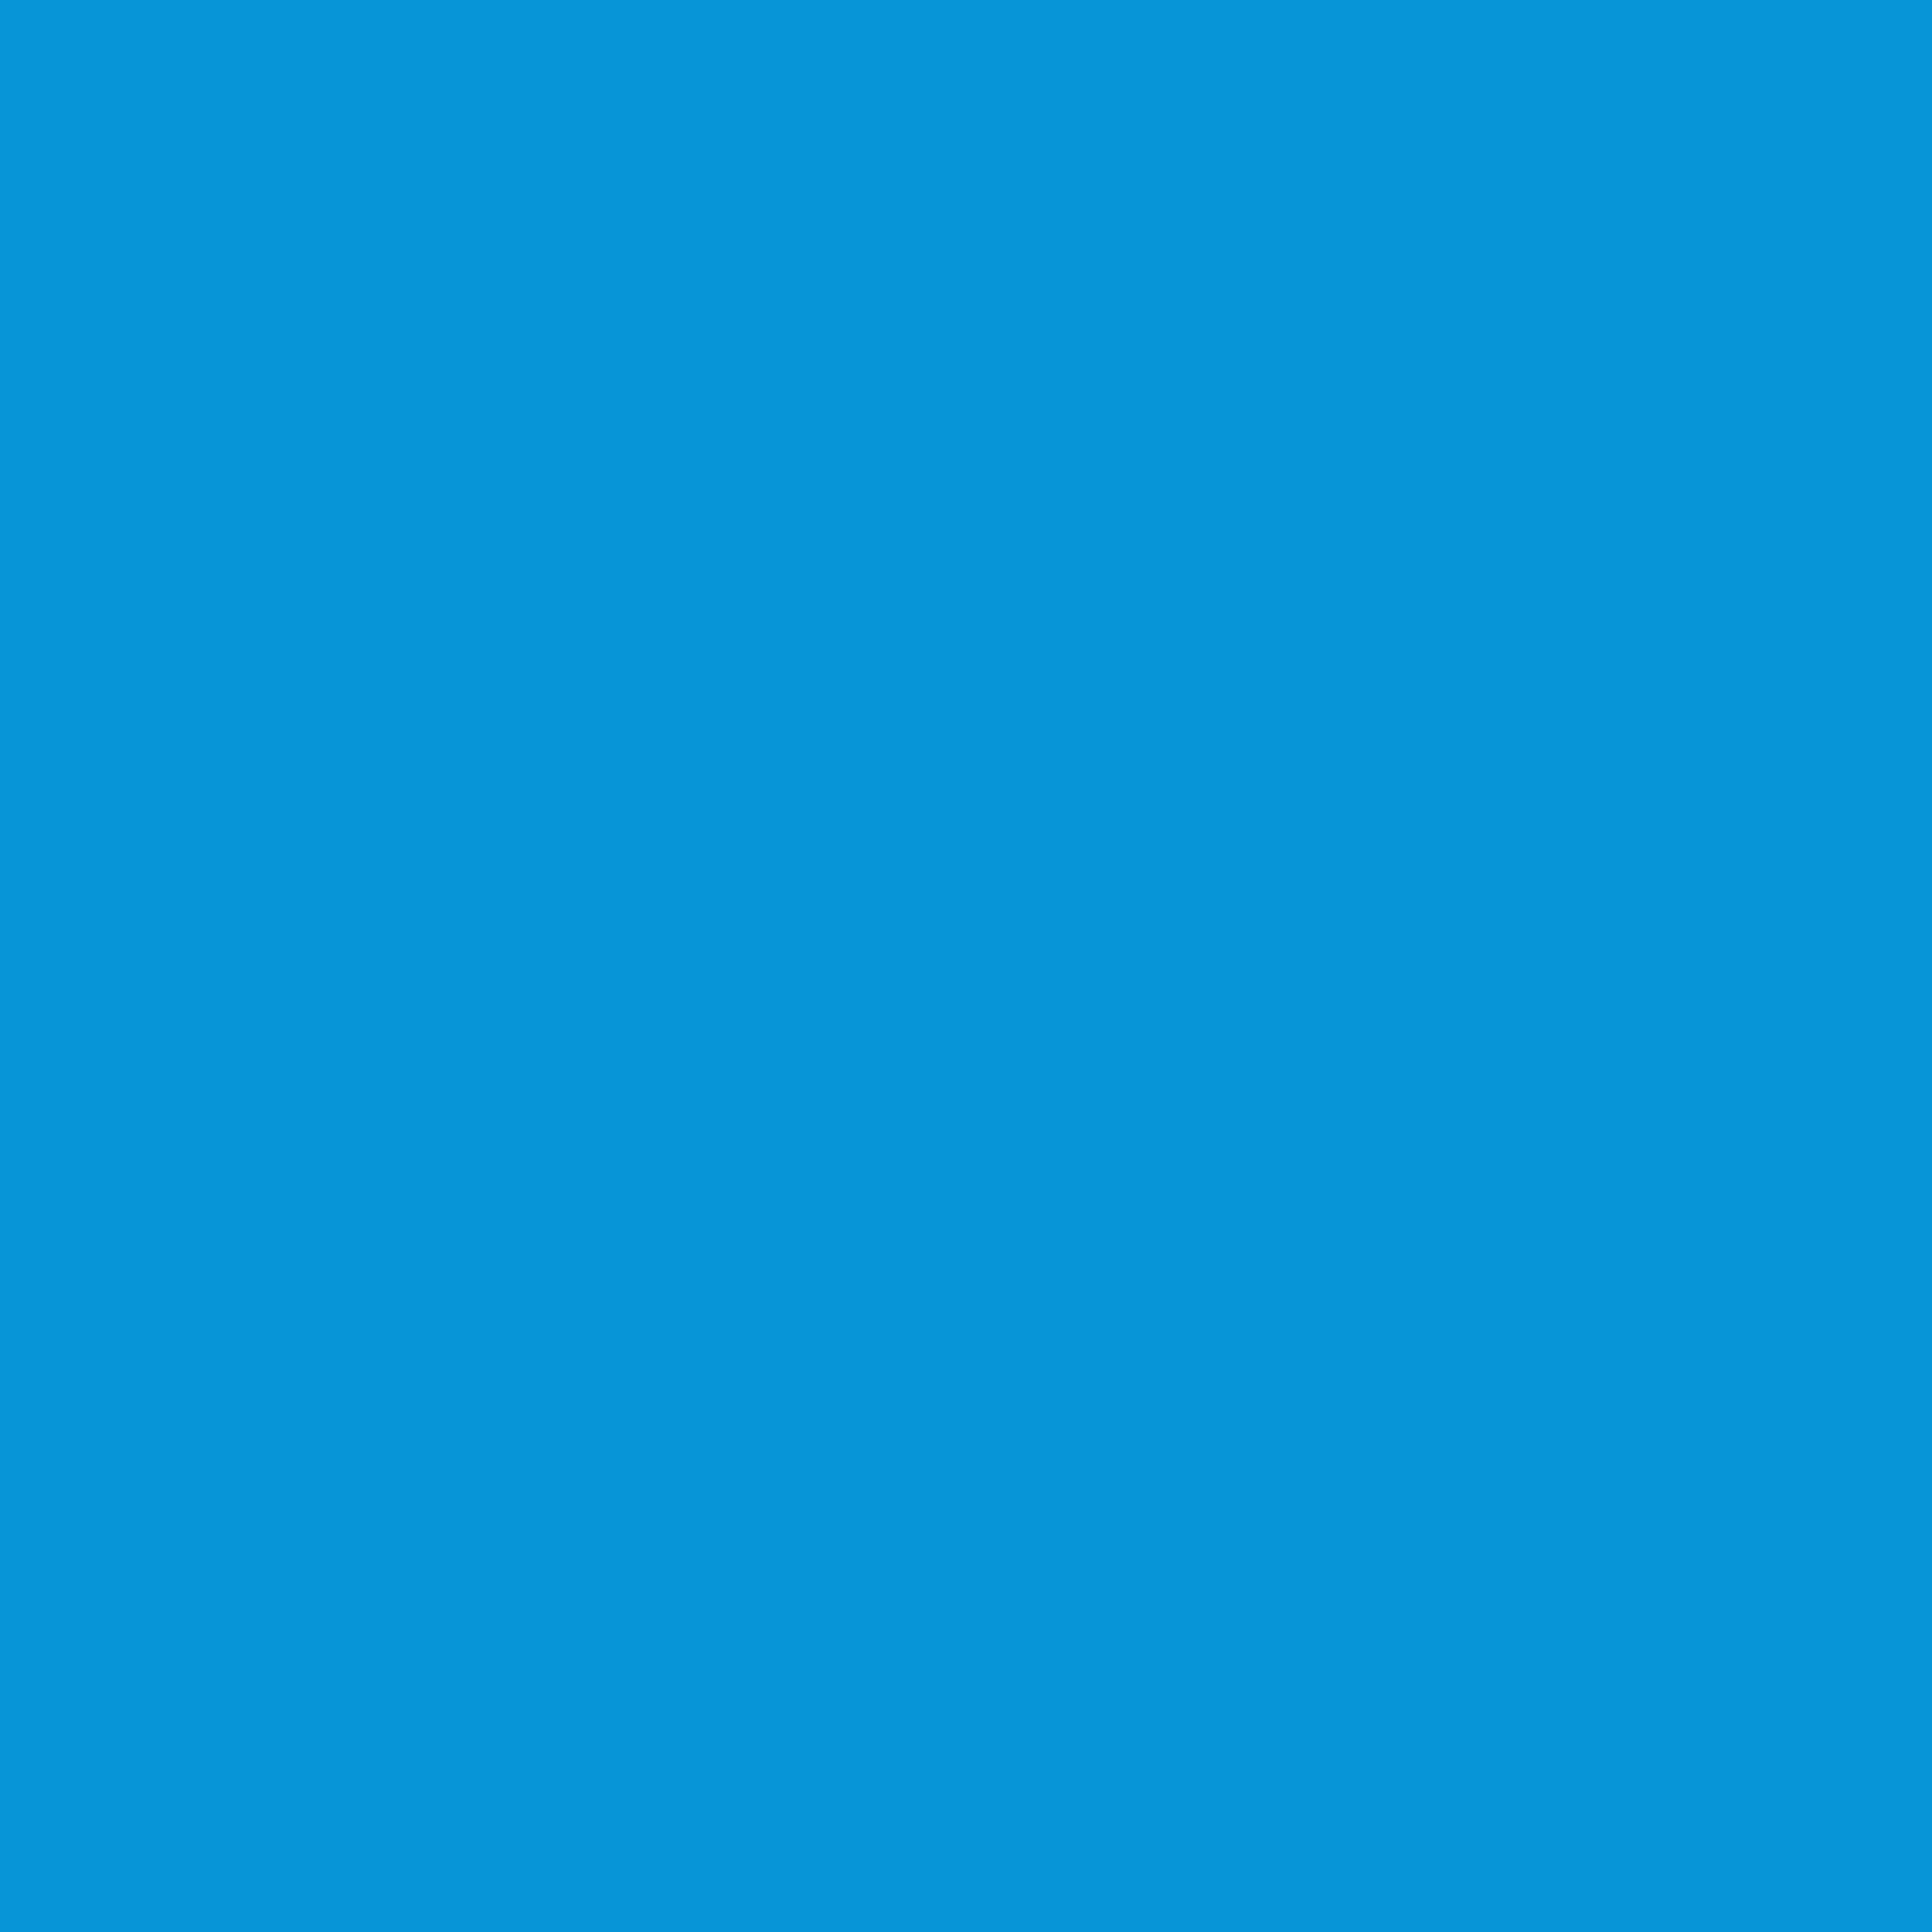 0-BLUE.jpg